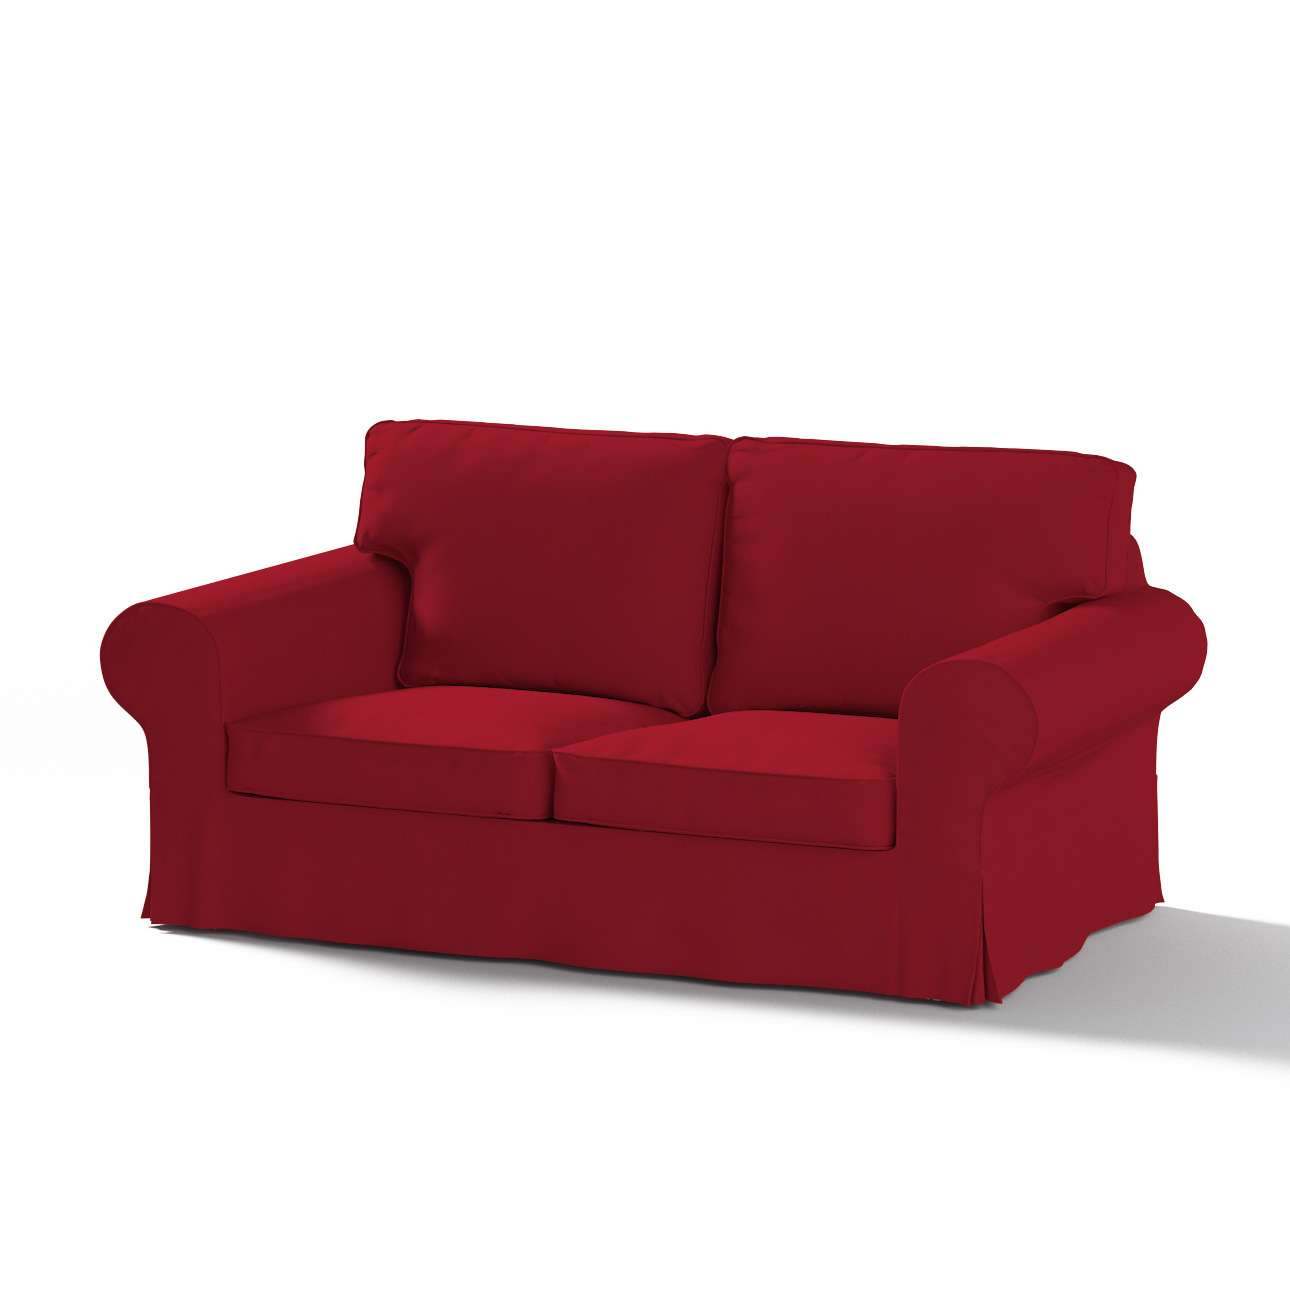 Ektorp 2 sæder sovesofa gammel model<br/>Bredde ca 195cm Betræk uden sofa fra kollektionen Chenille, Stof: 702-24